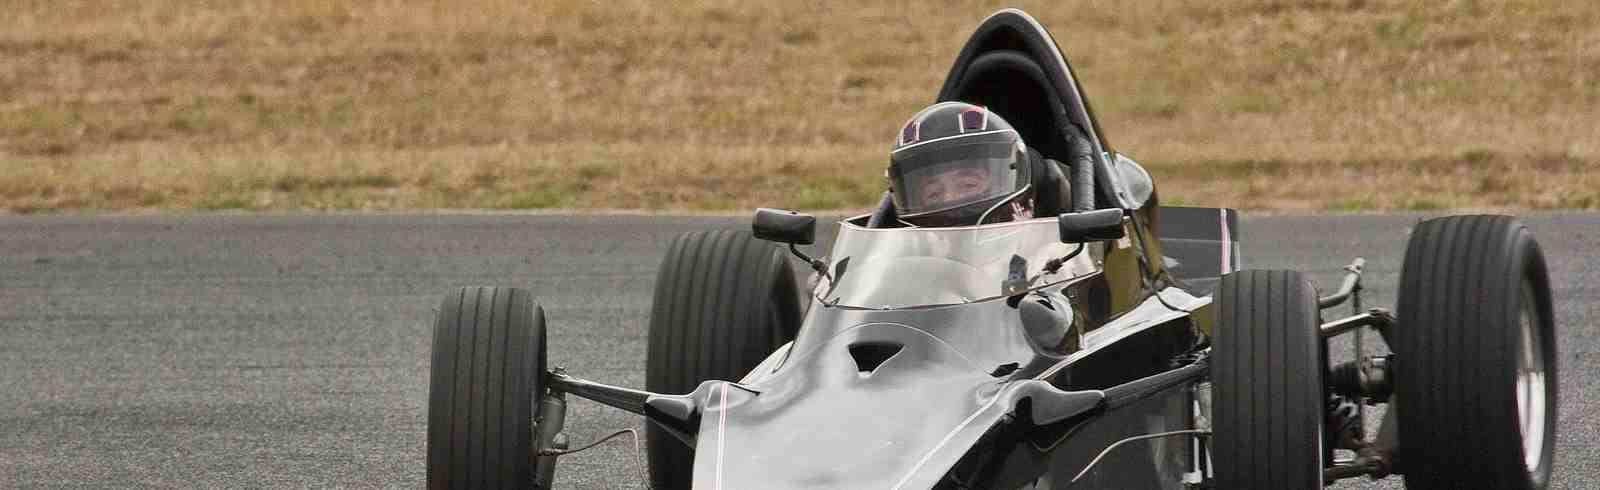 Lola Formula Fords